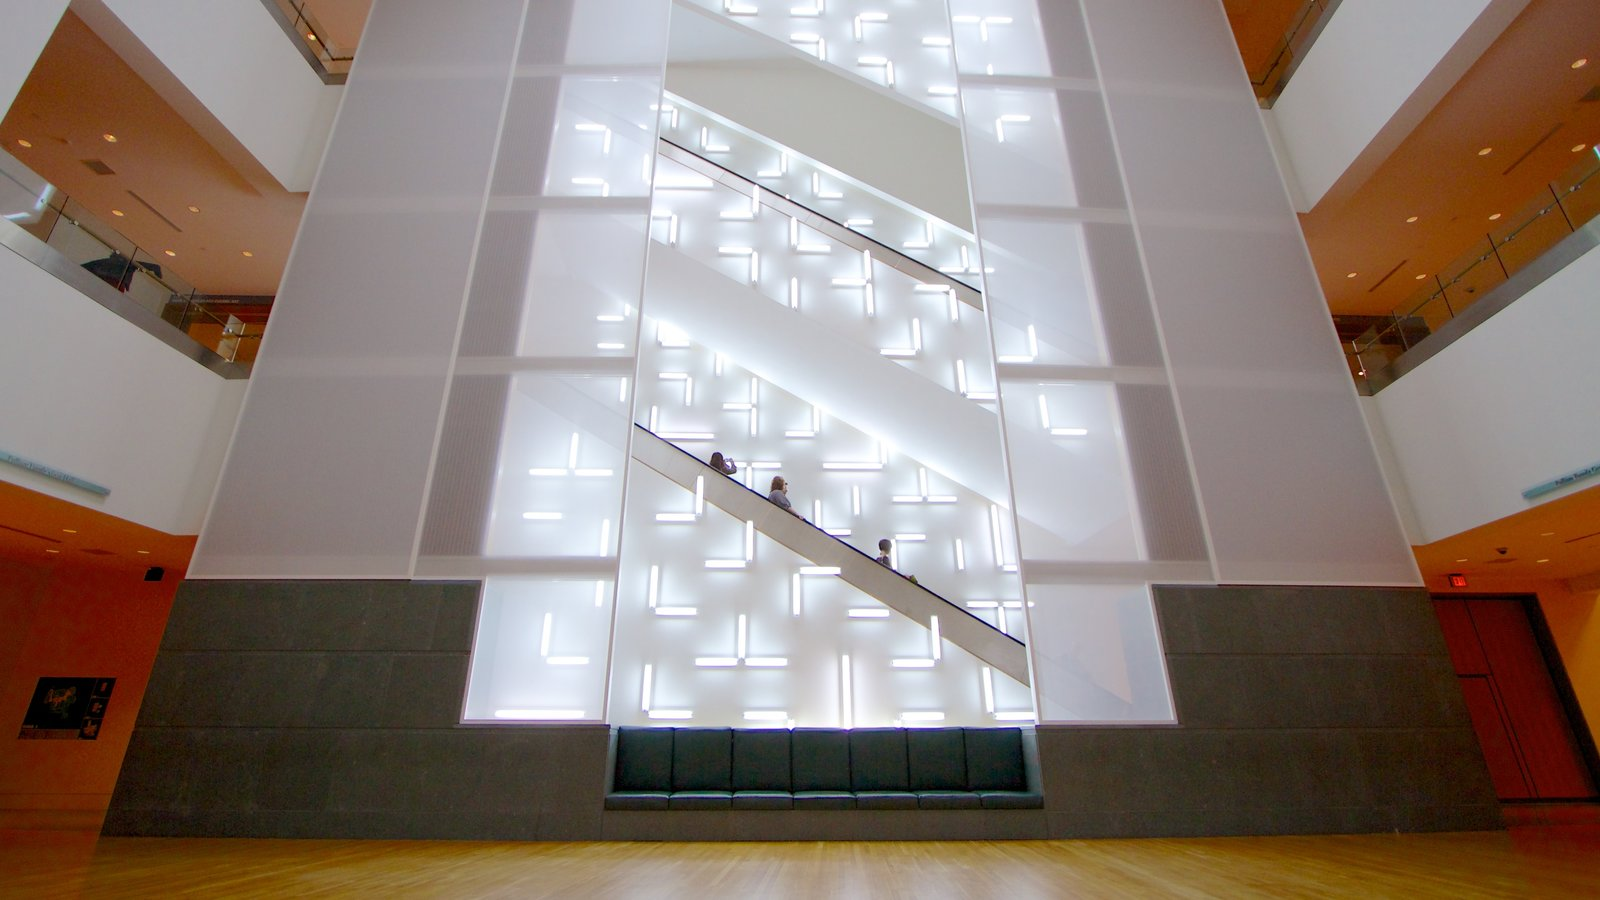 Indianapolis Museum of Art mostrando vistas interiores